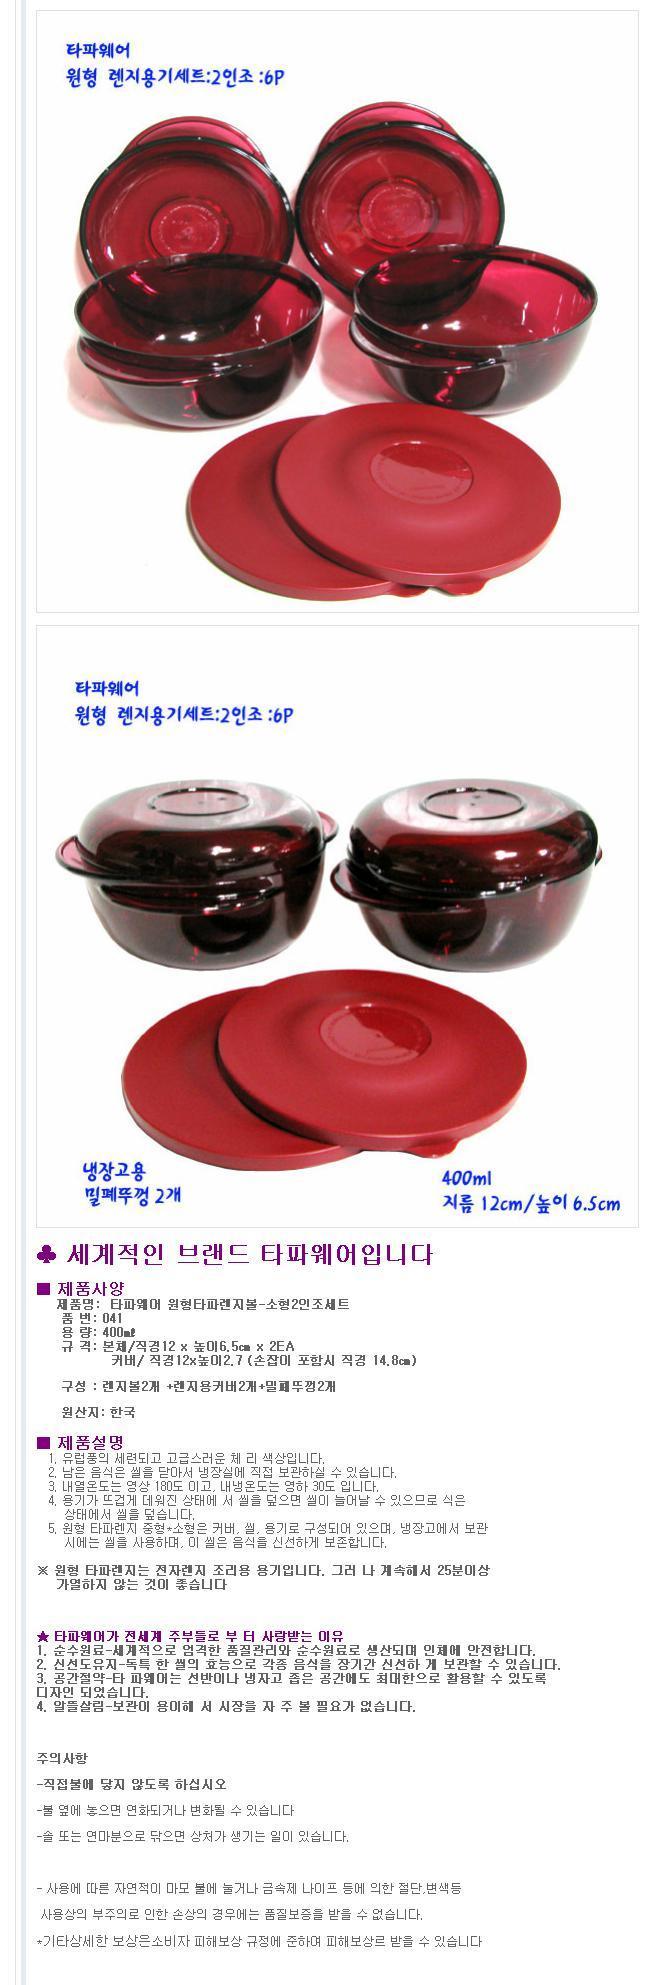 forward.php?url=http%3A%2F%2Fai.esmplus.com%2Fm2korea9731%2Flessd0126C%2F8126.jpg